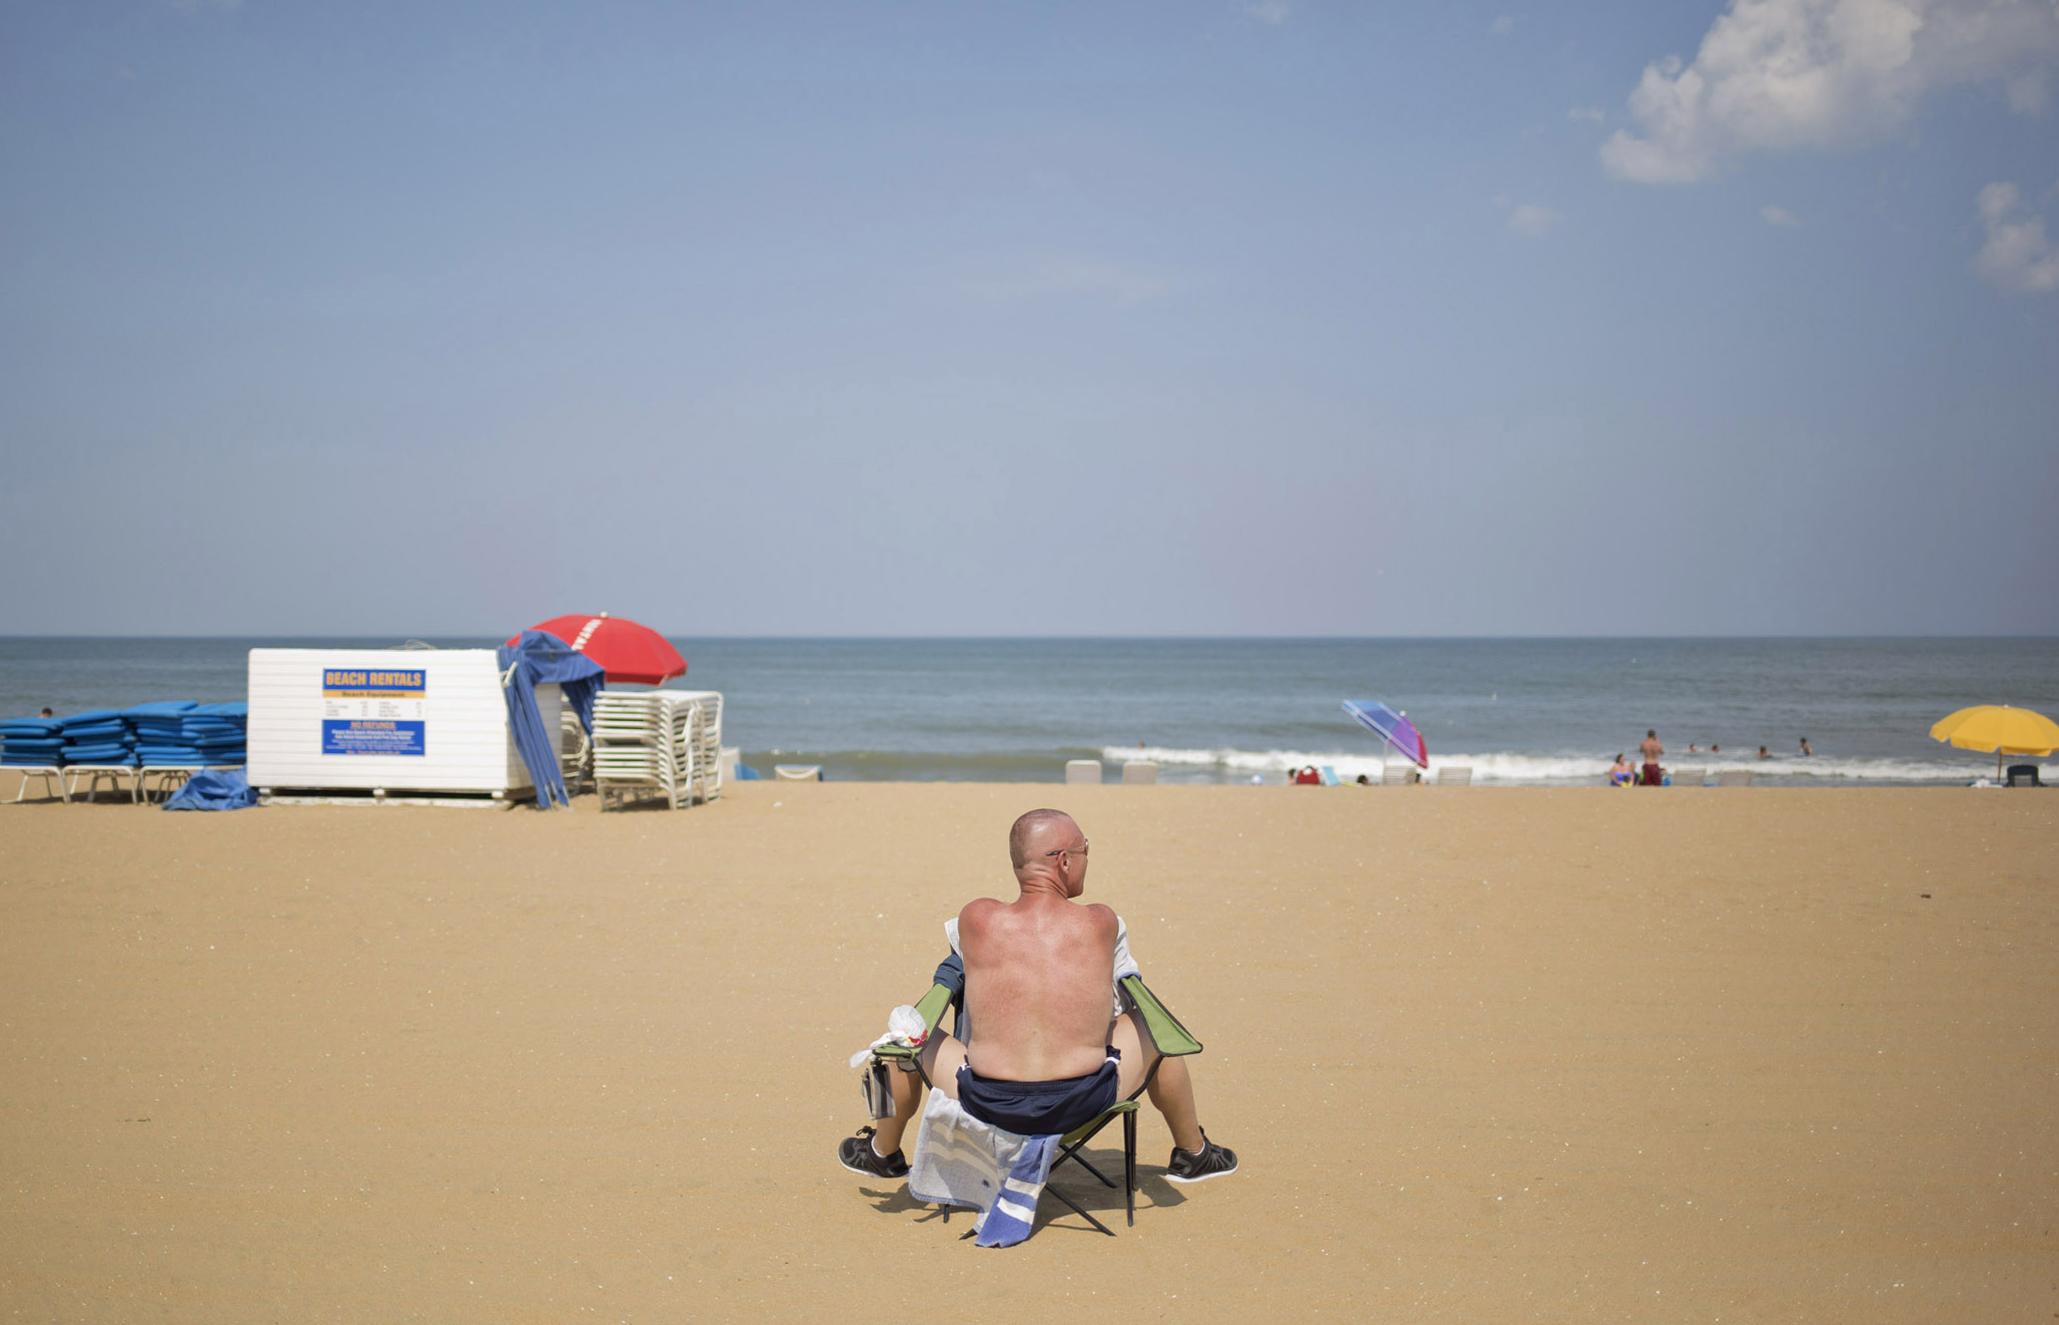 106 Degrees. Virginia Beach, Virginia.